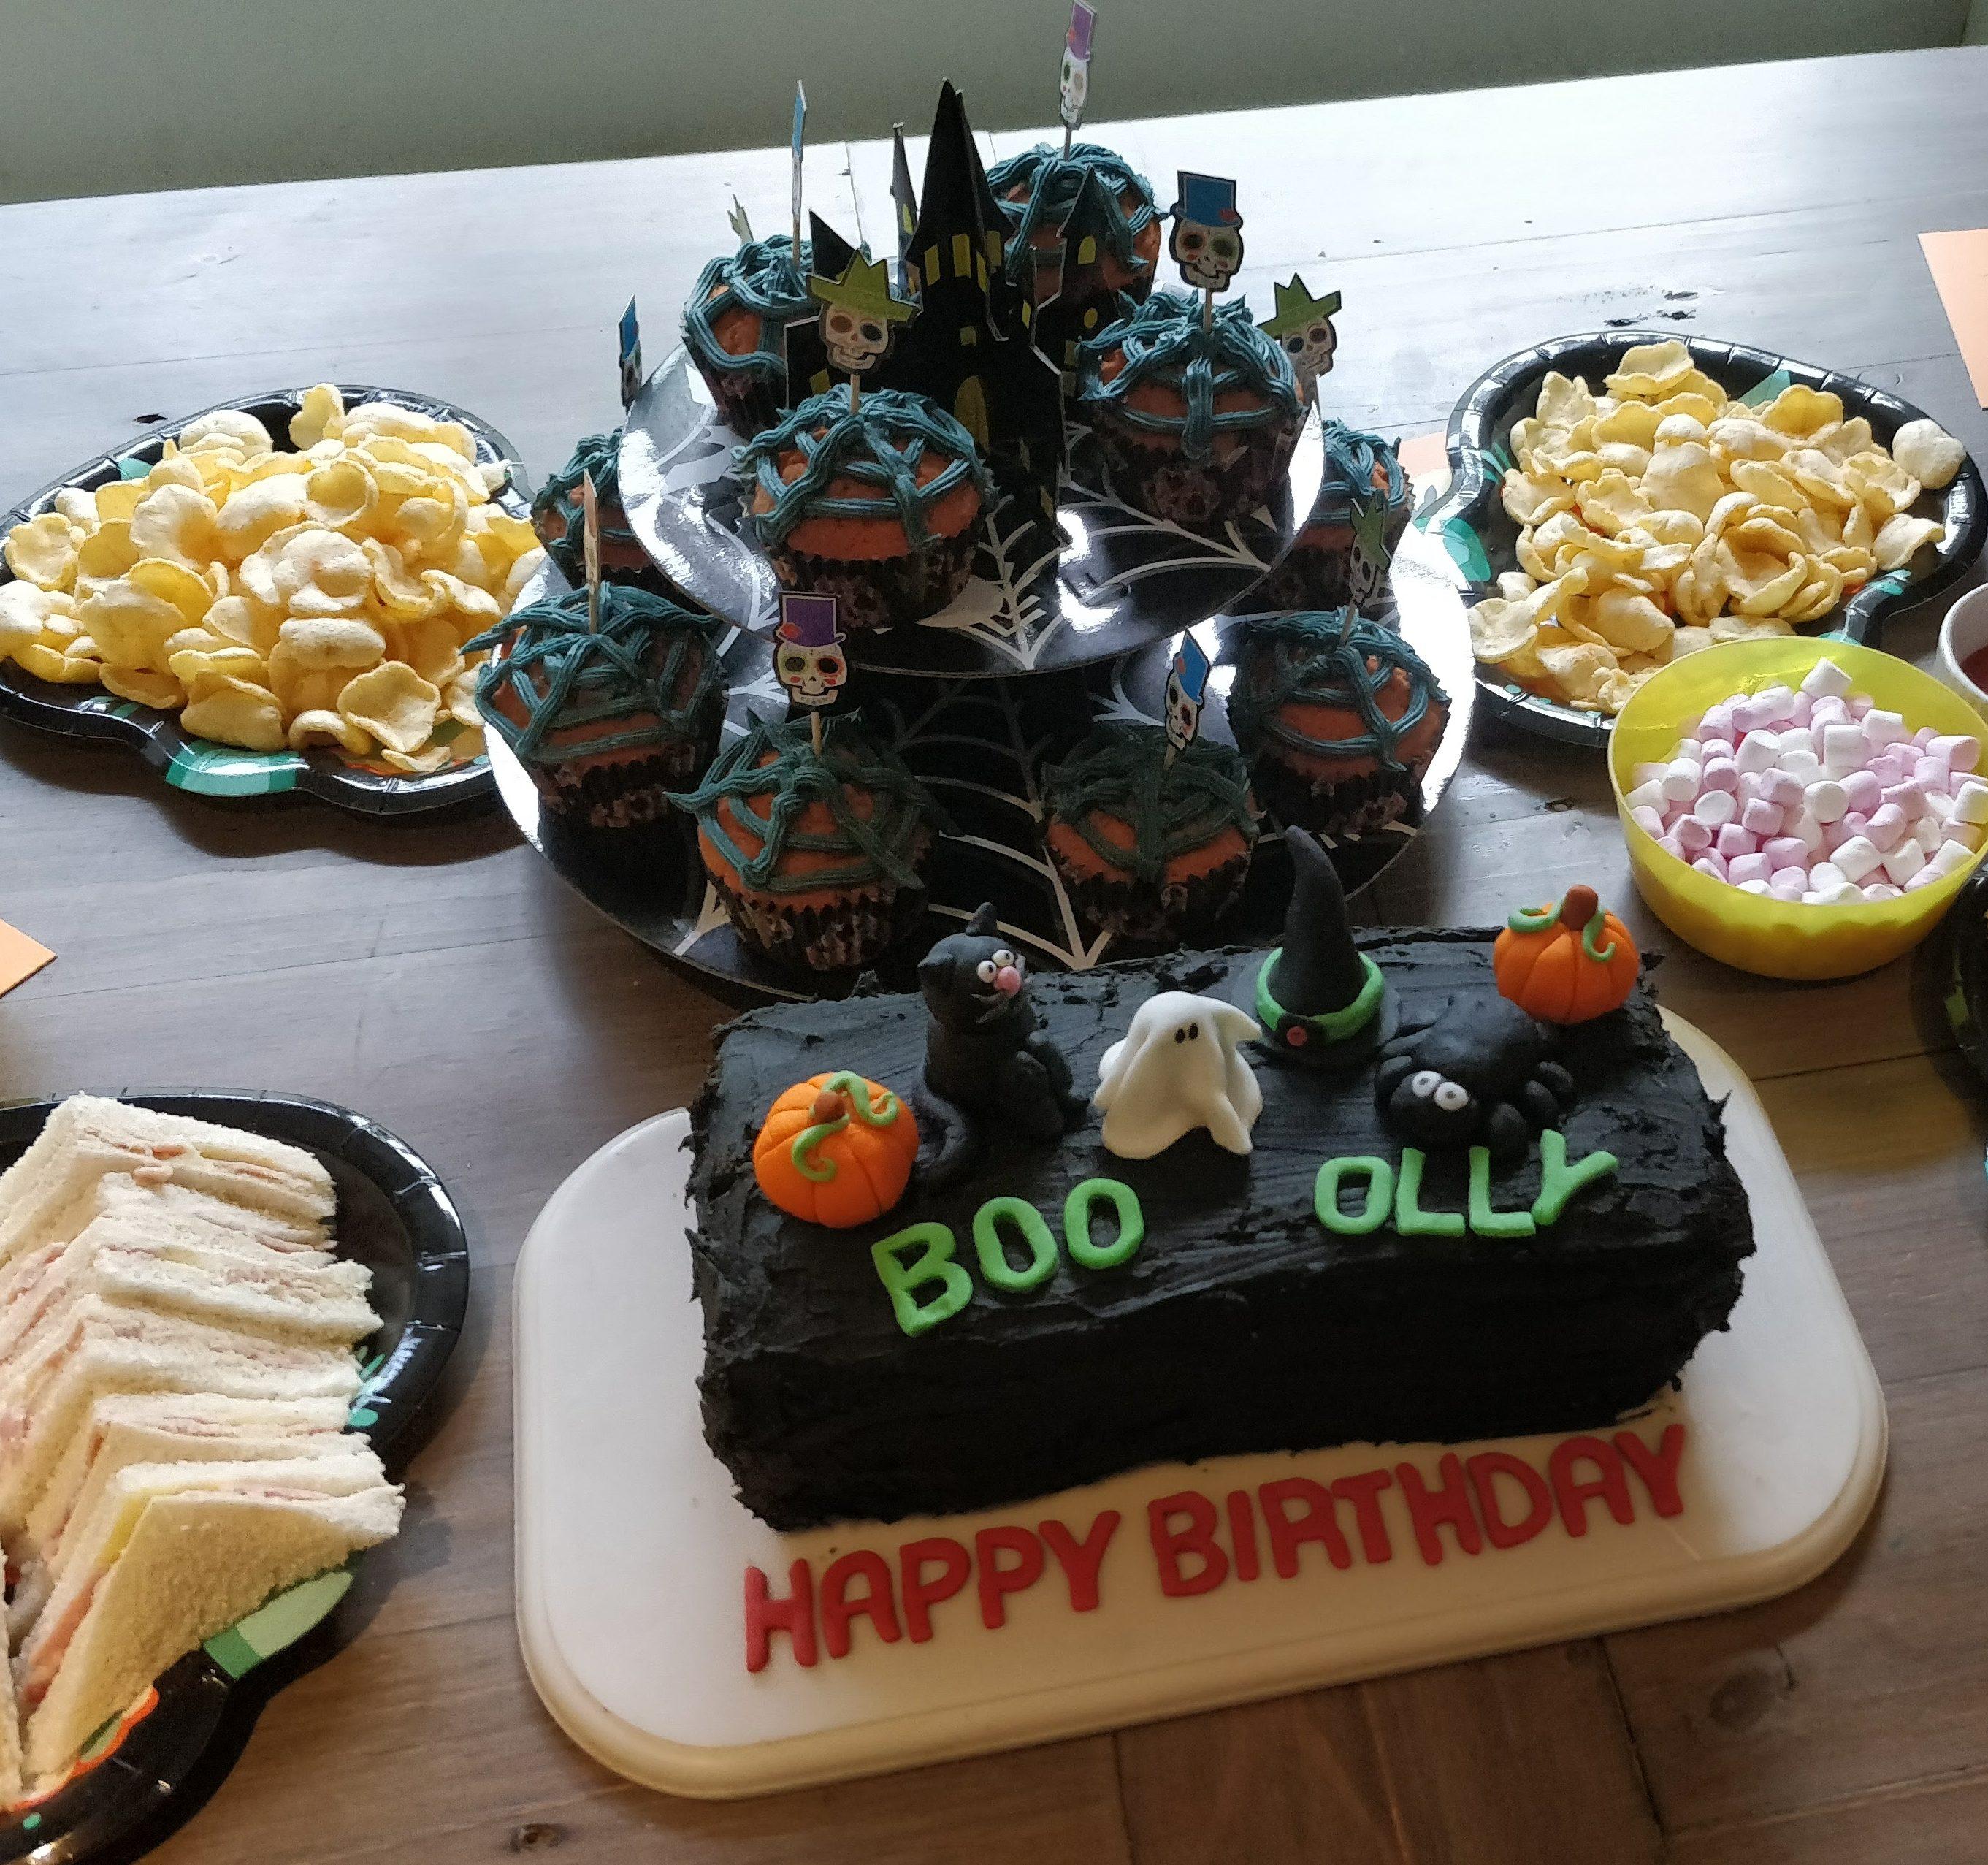 Swell Ollys Halloween Themed Birthday A Spooktacular Celebration Funny Birthday Cards Online Fluifree Goldxyz